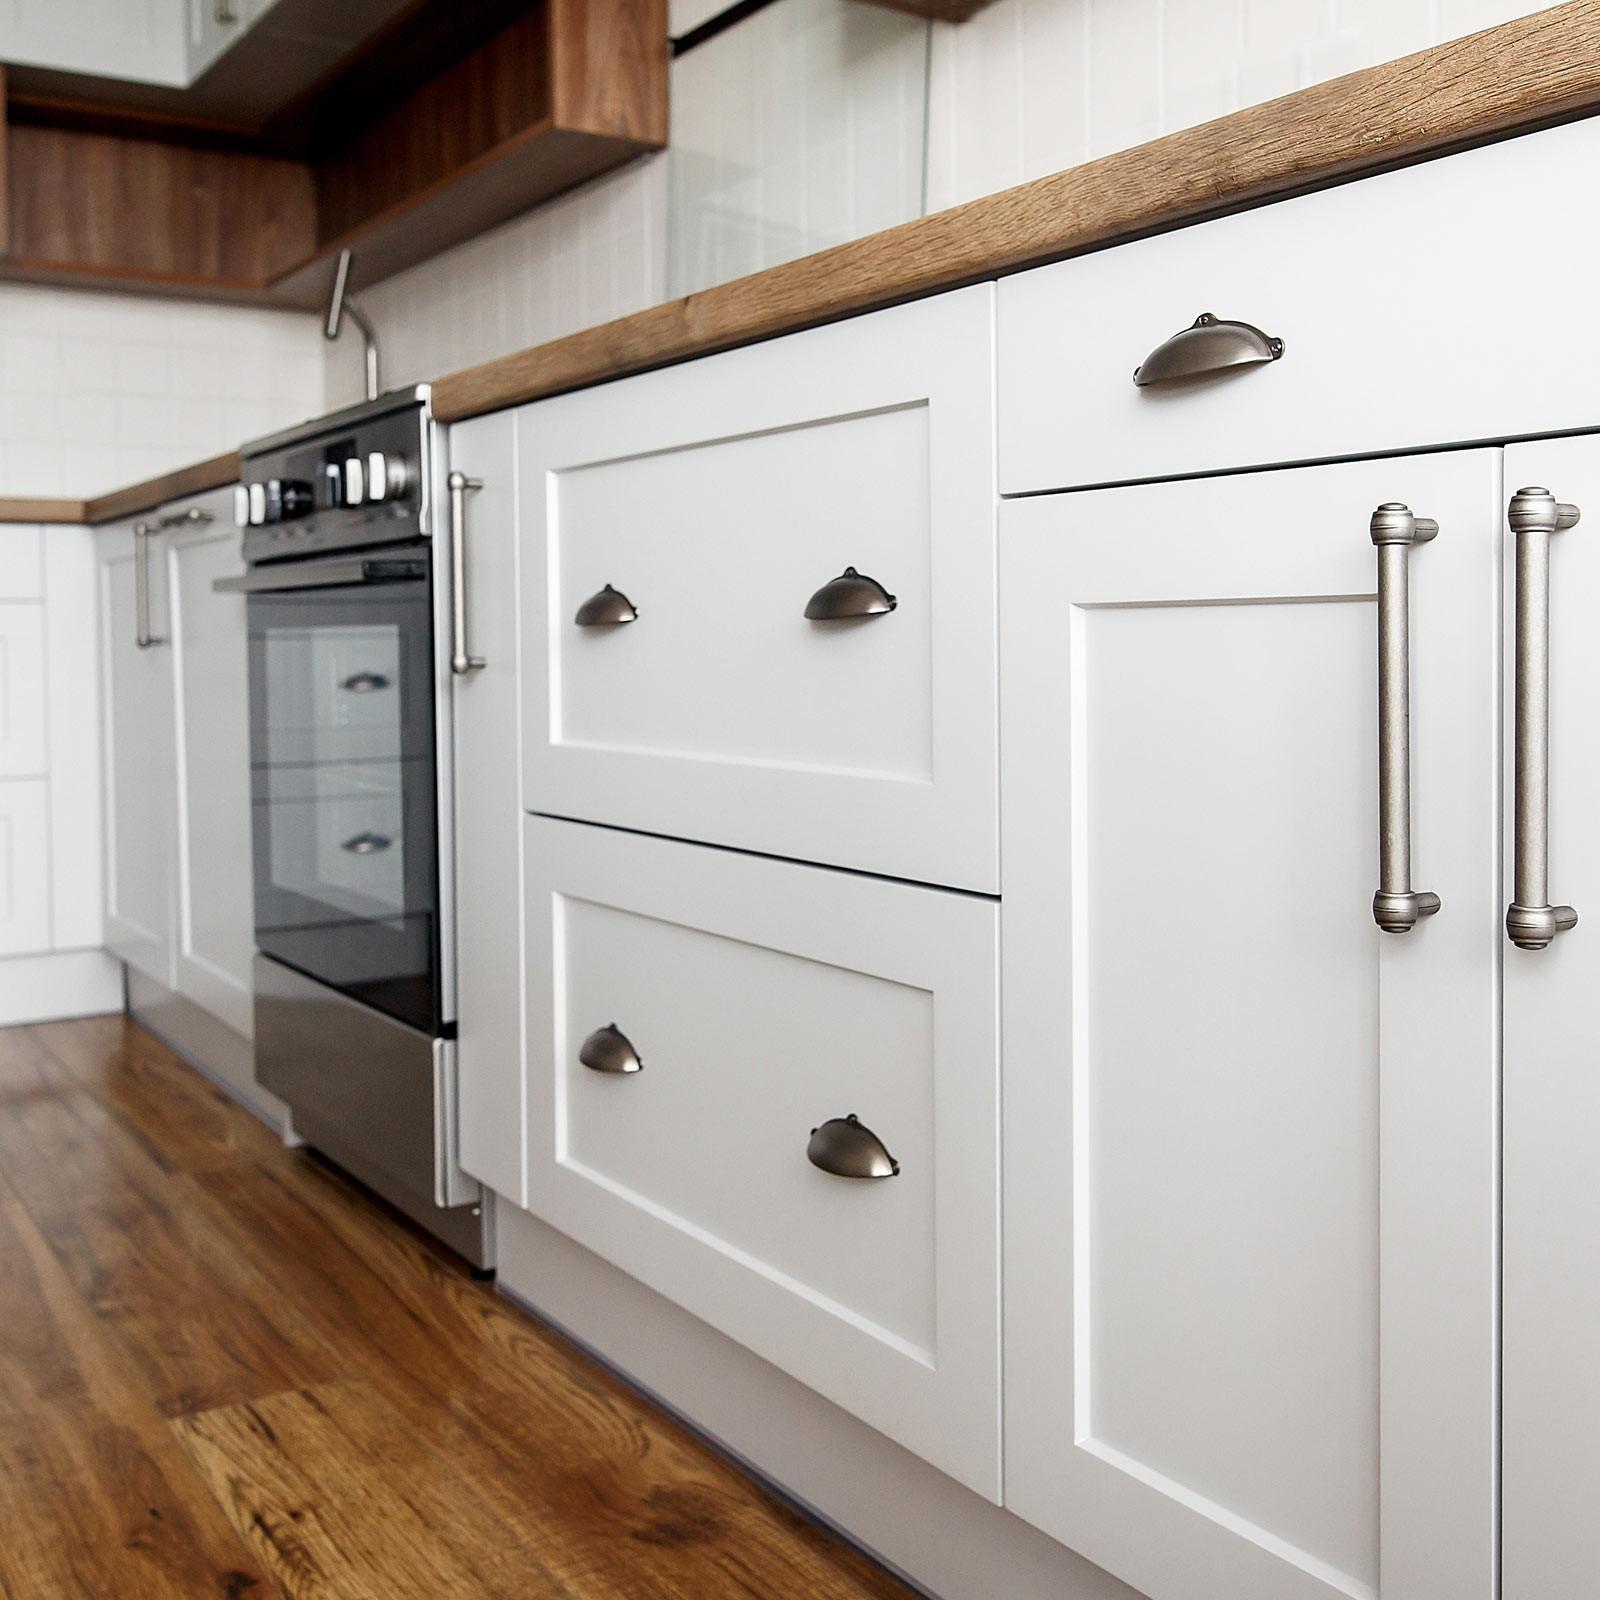 Cabinets White | Wacky's Flooring